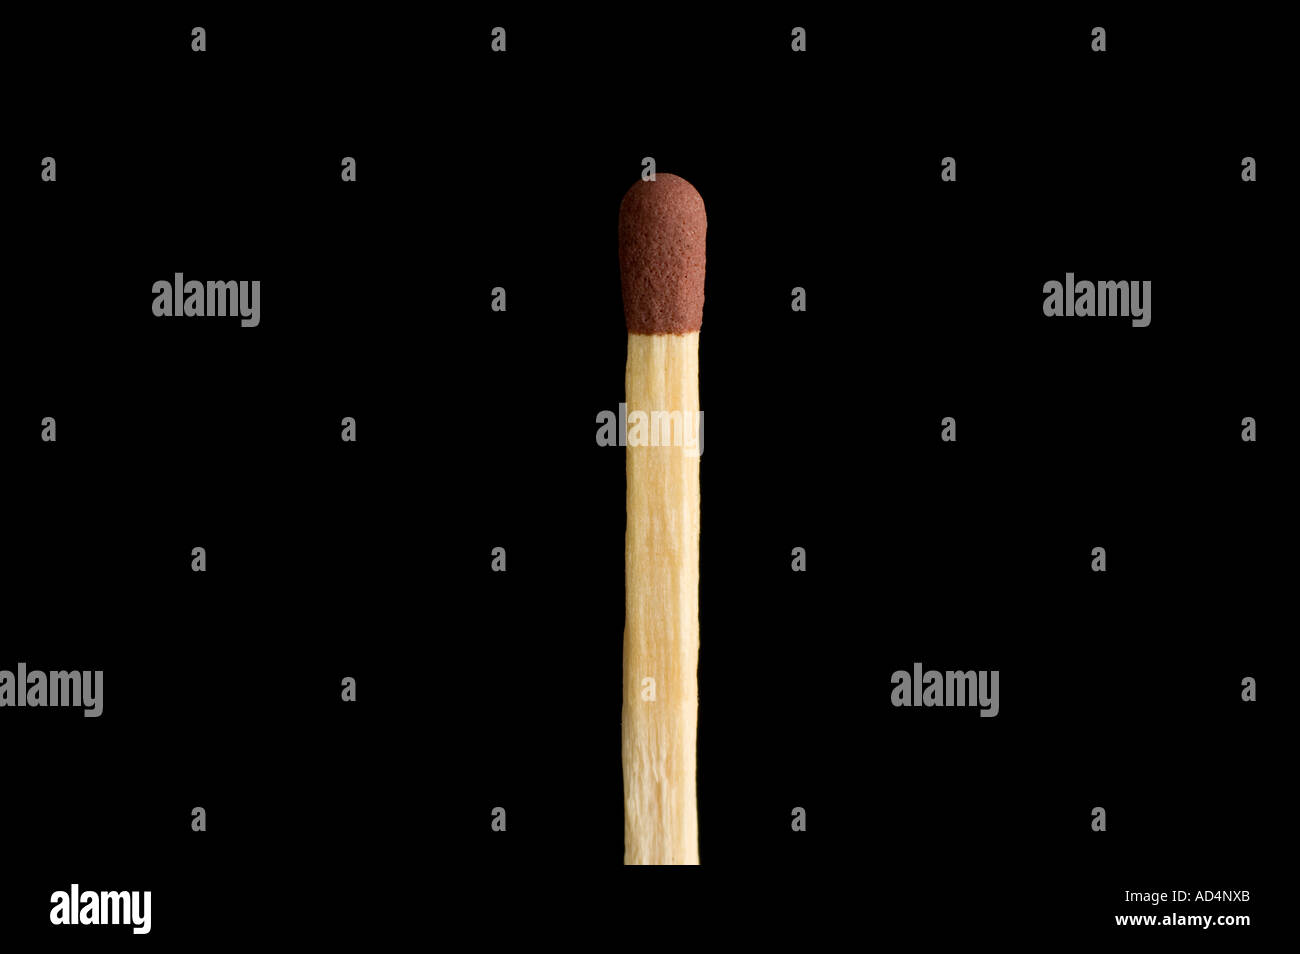 unlit match on a black background - Stock Image